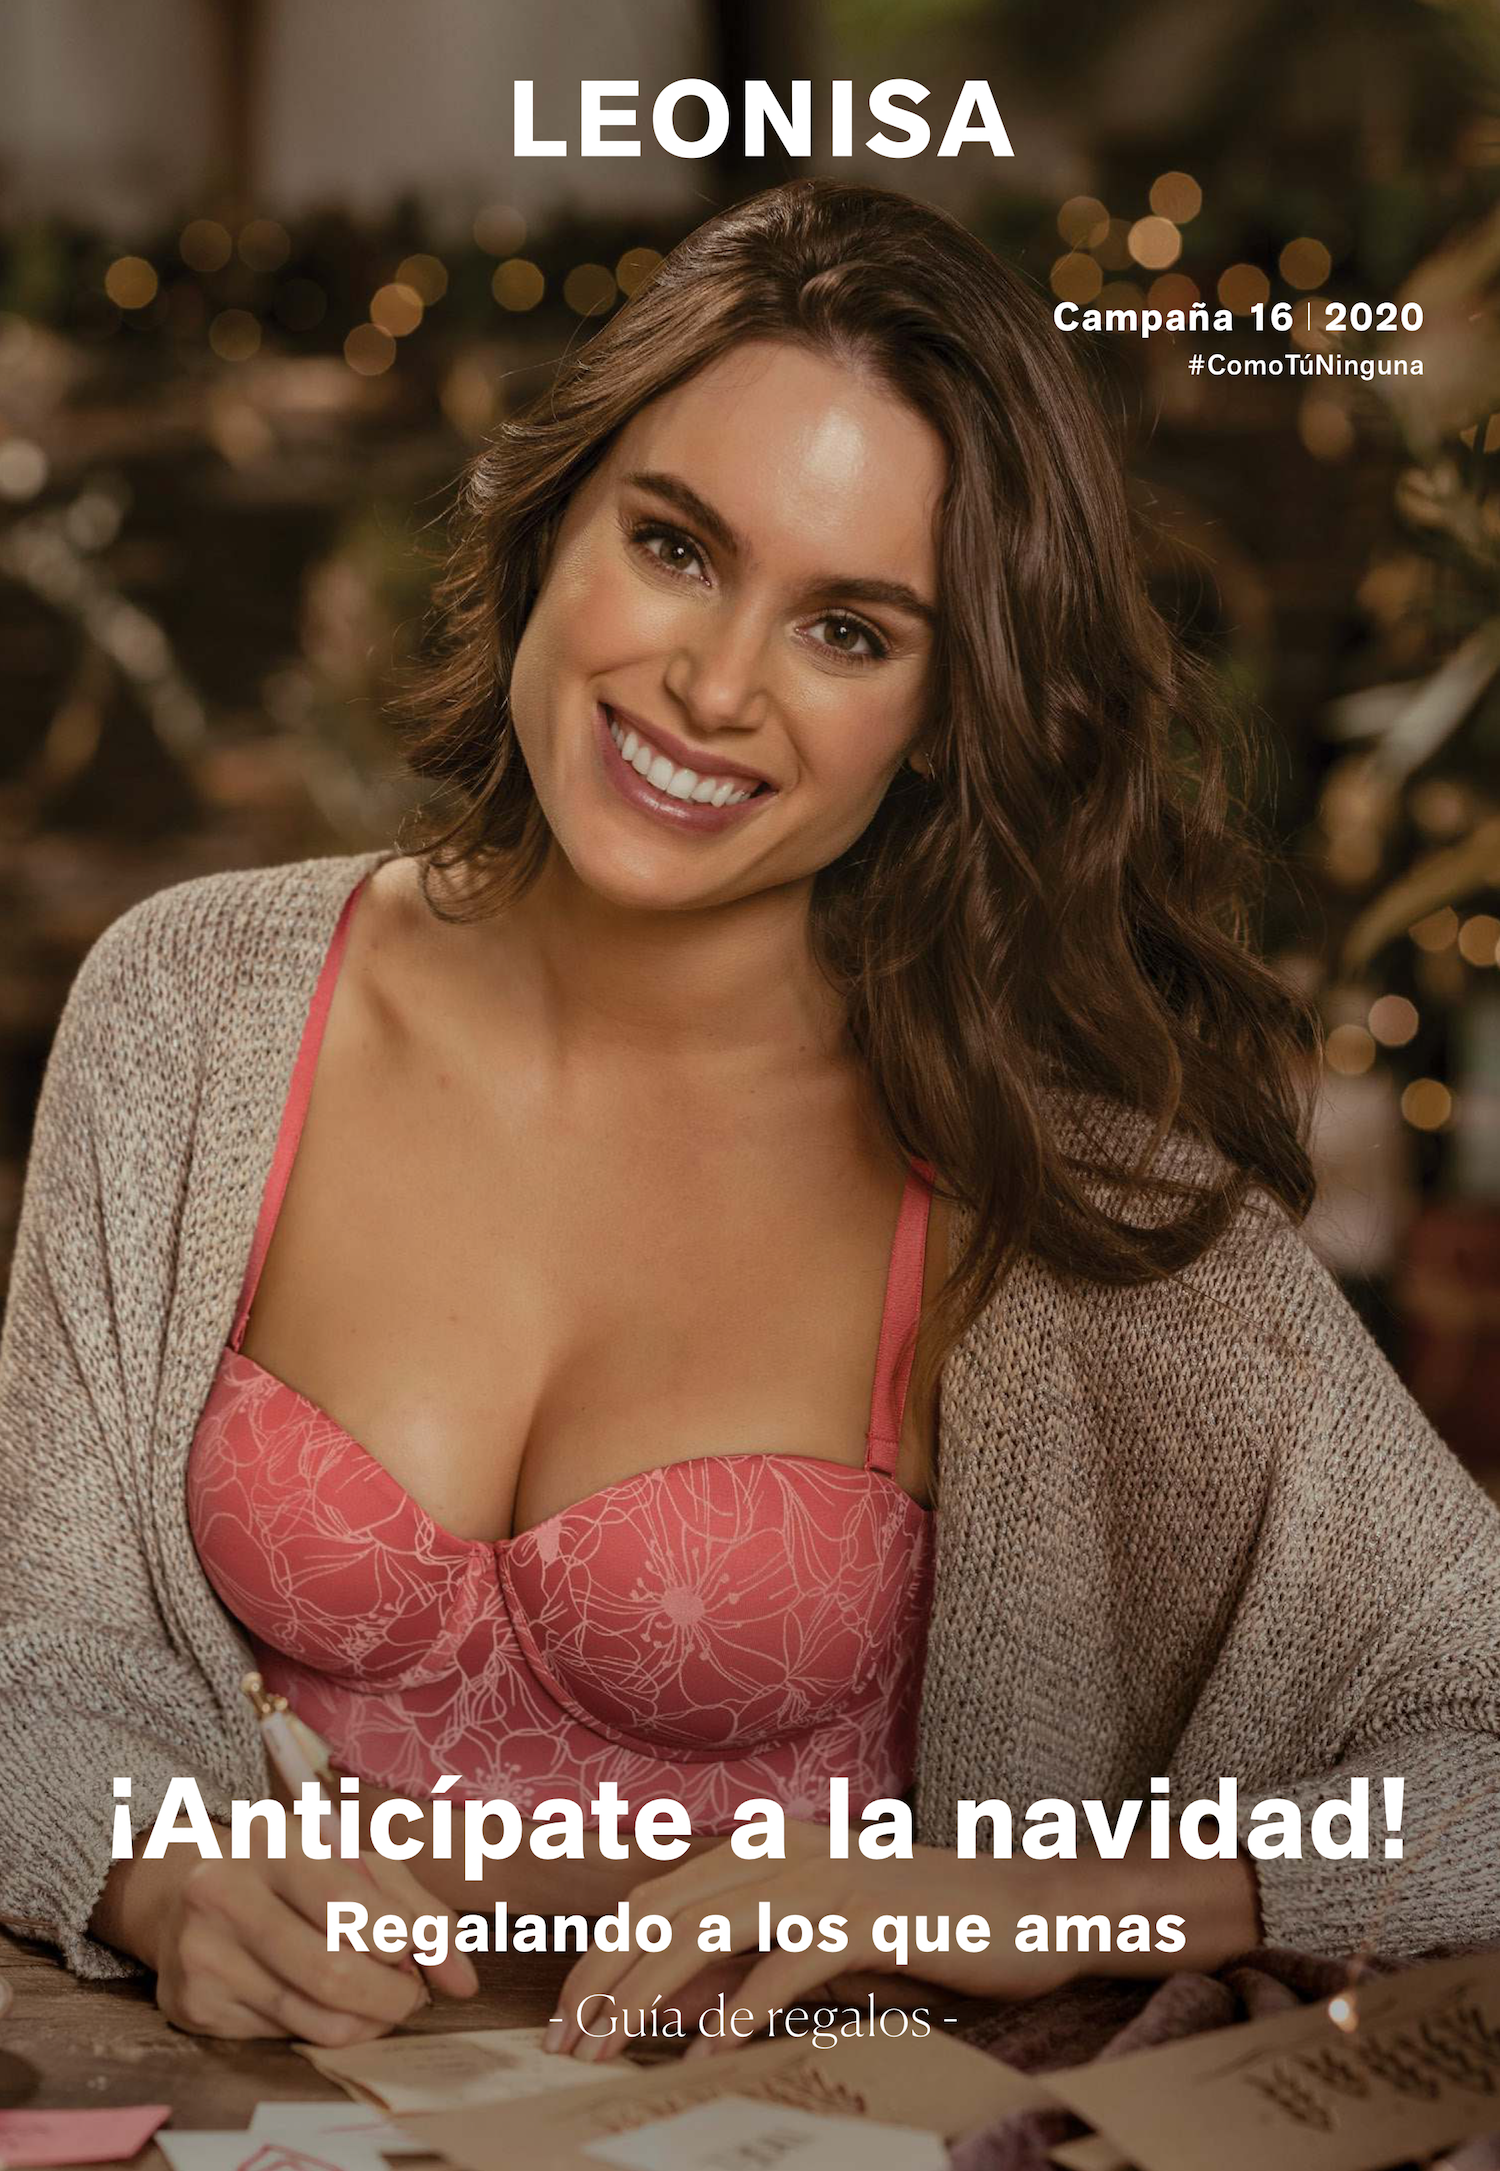 Leonisa Preventa Navidad 16 20 Undergarments Bra Fashion